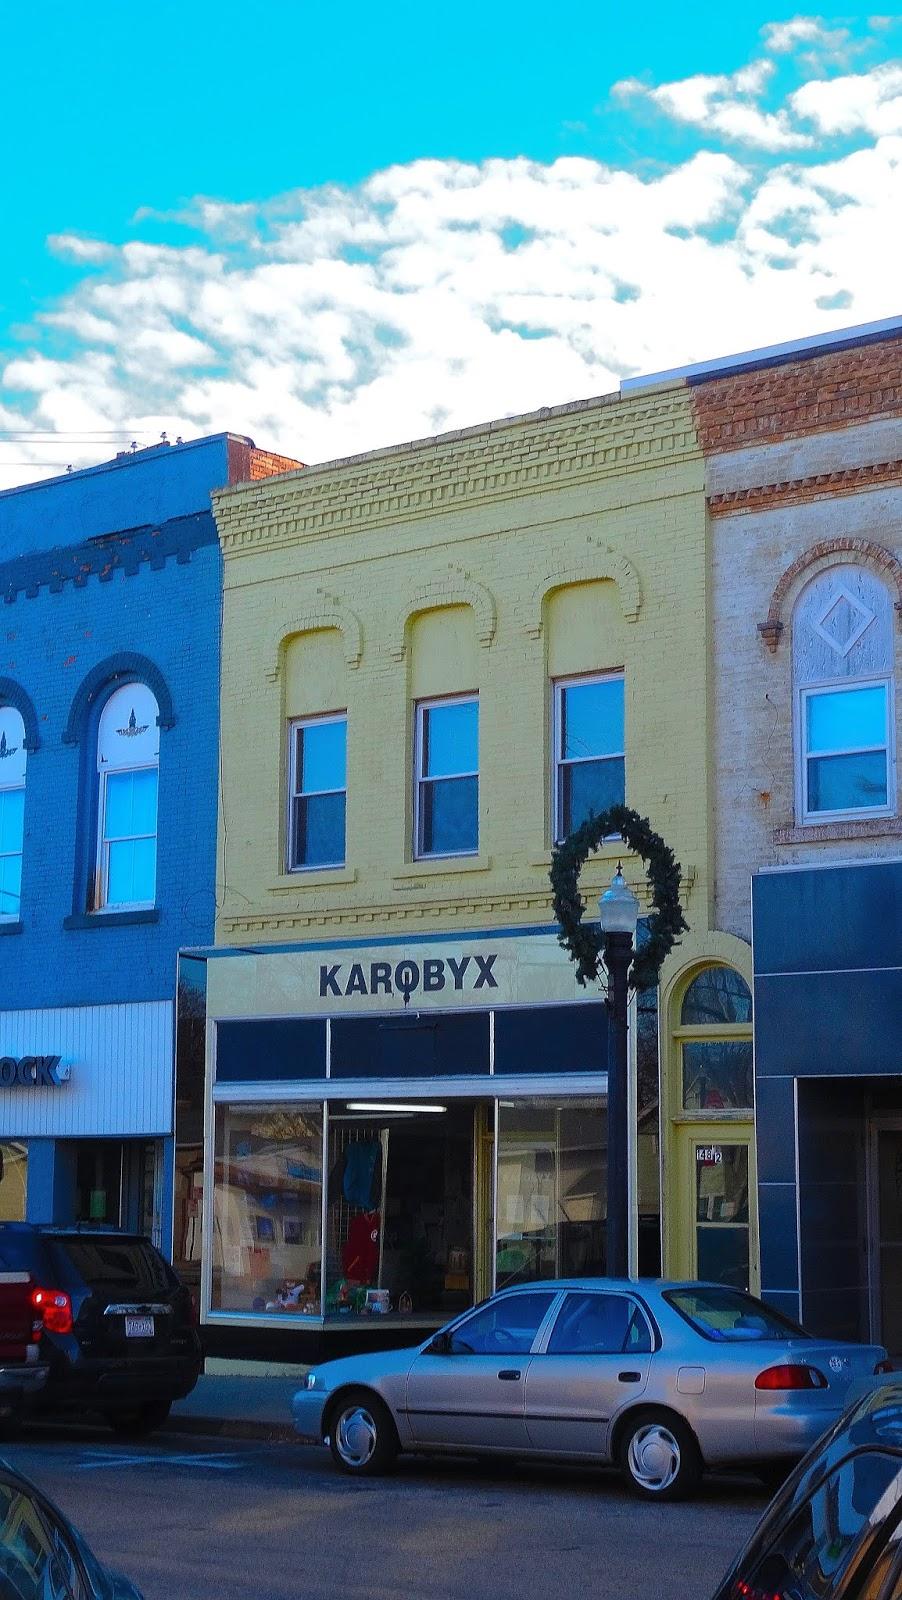 Karobyx Inc   restaurant   148 3rd St, Baraboo, WI 53913, USA   6083564113 OR +1 608-356-4113